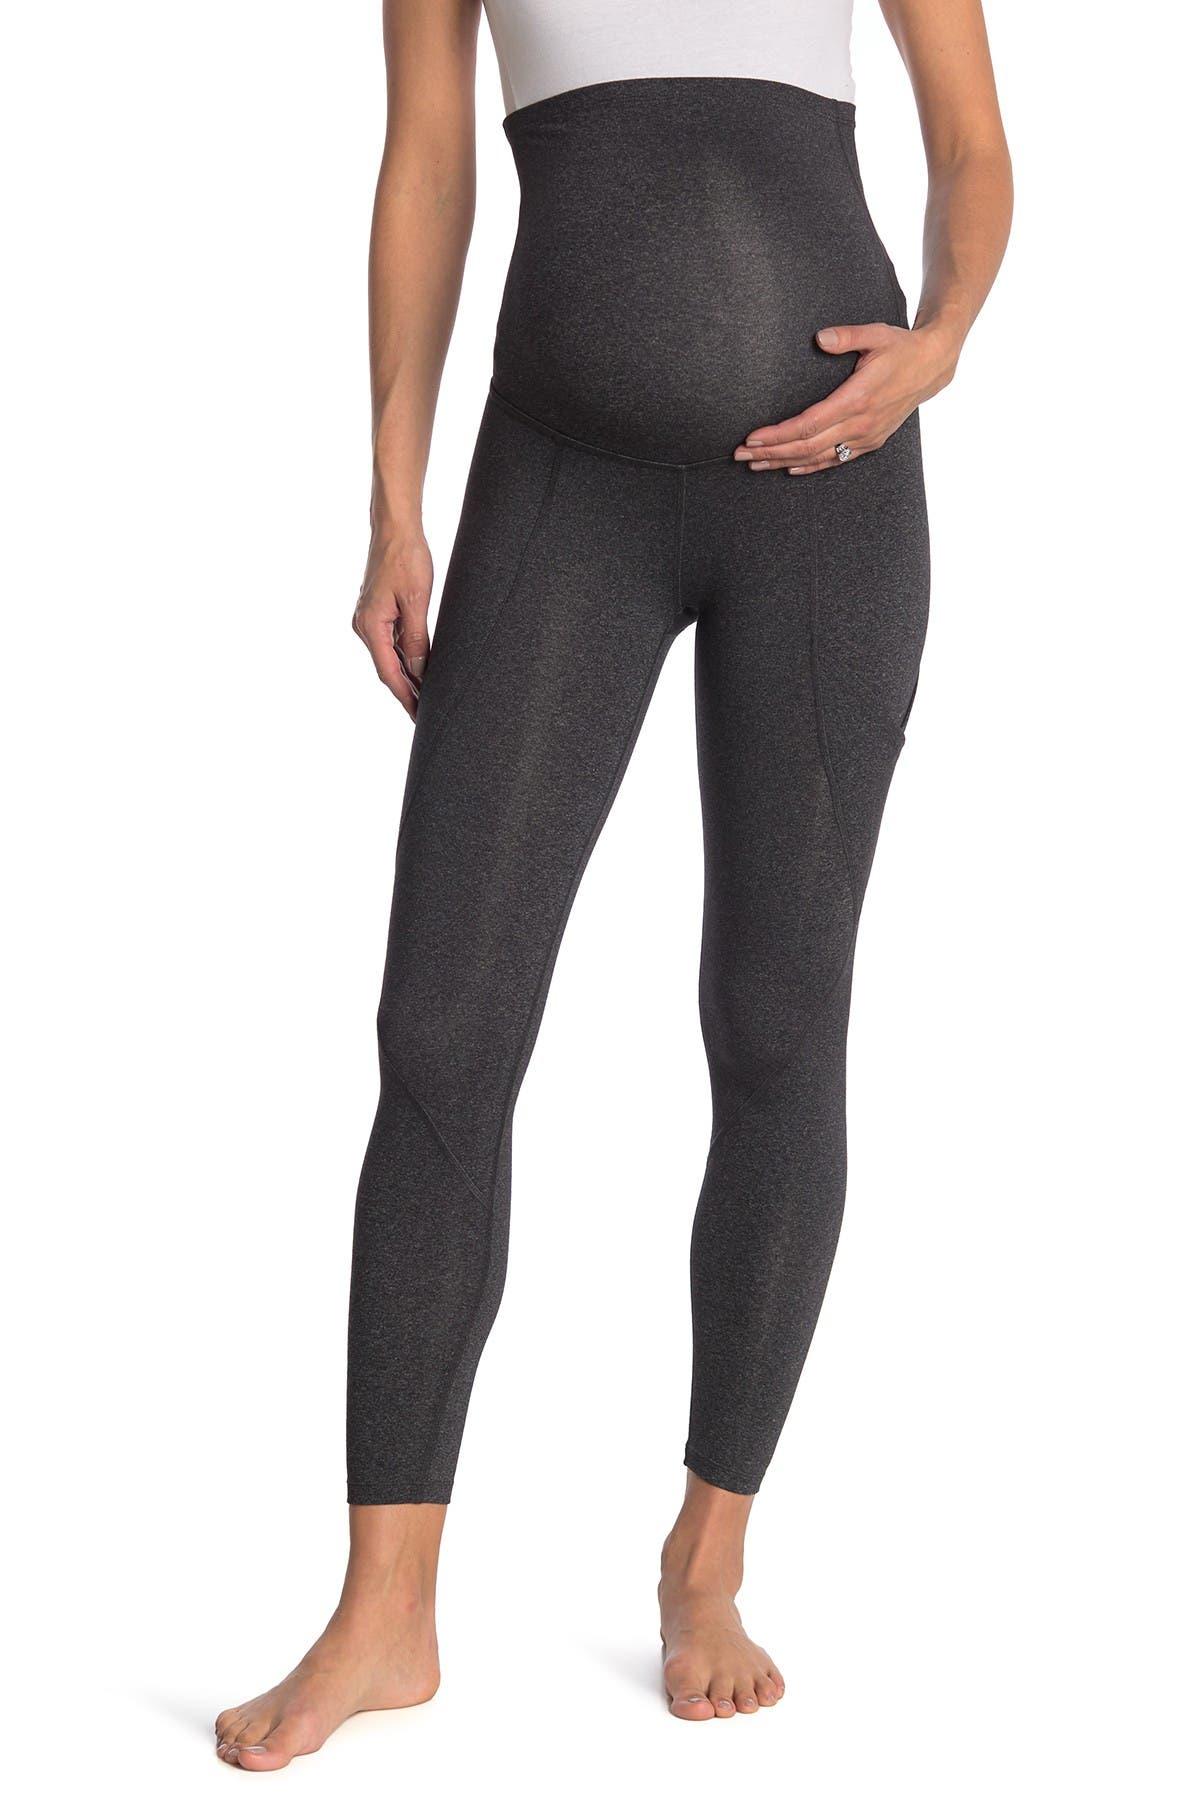 Image of Beyond Yoga Palomino High Waist Leggings